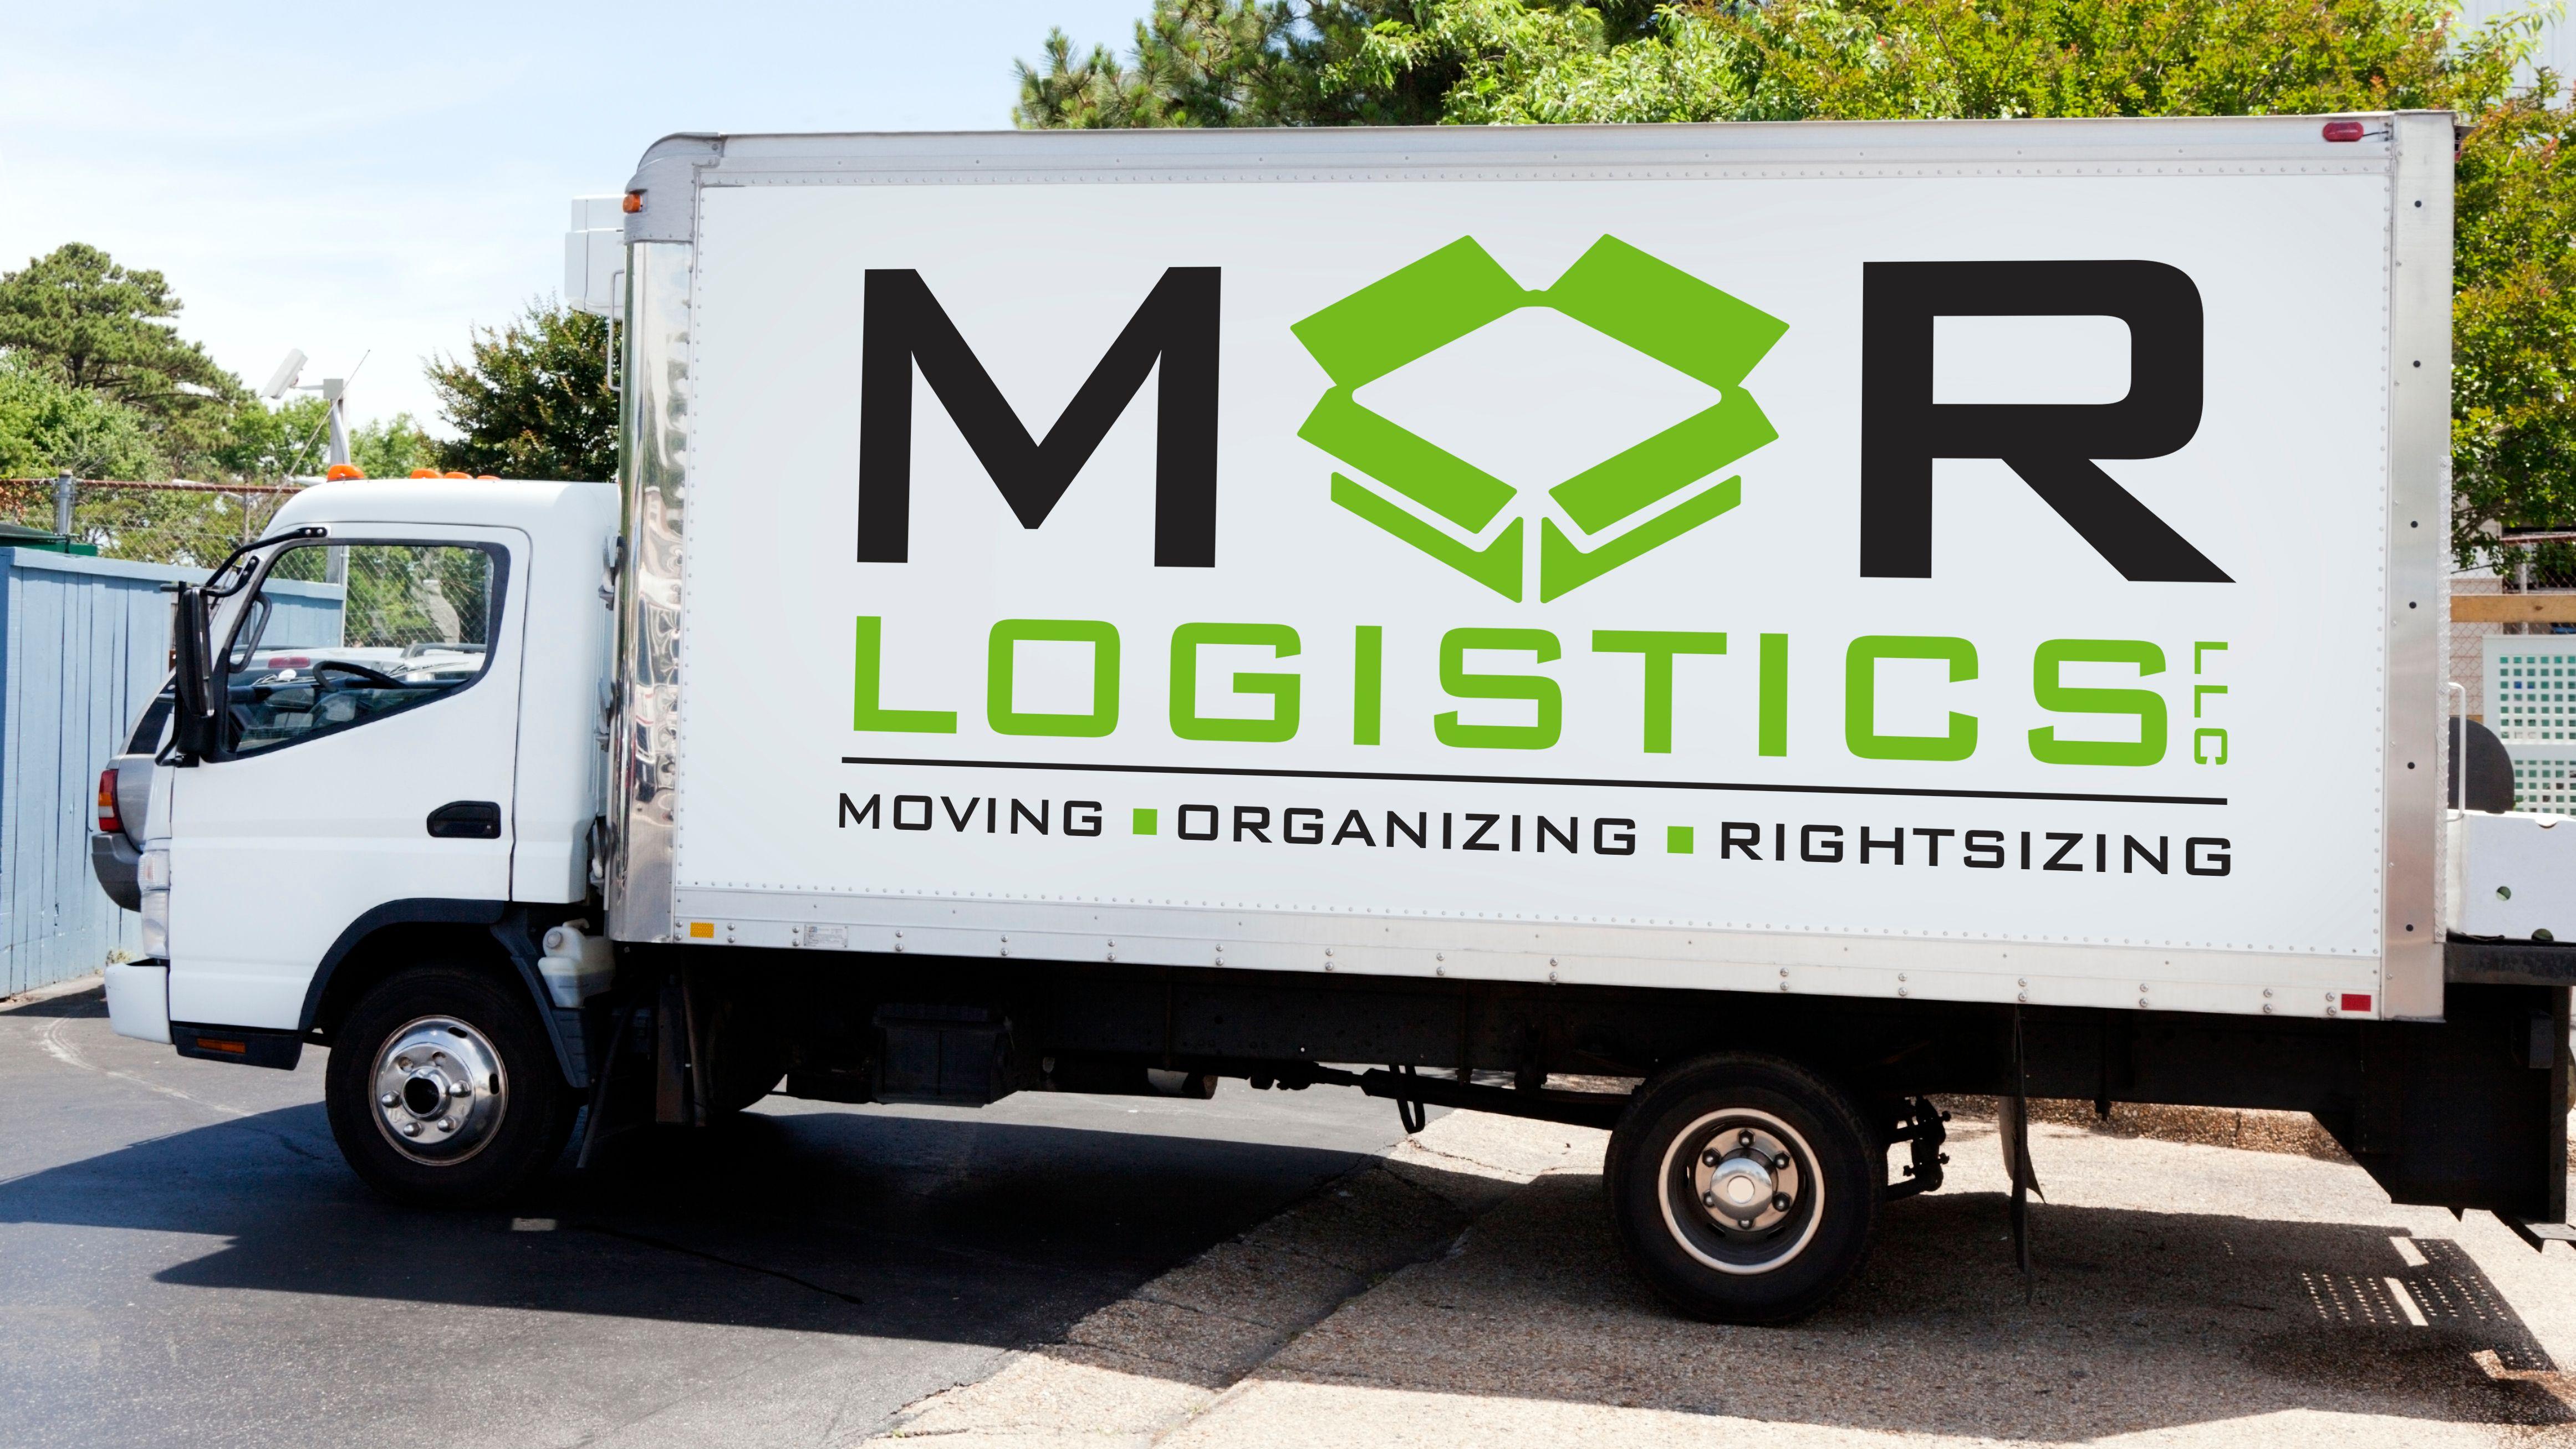 M&R Logistics